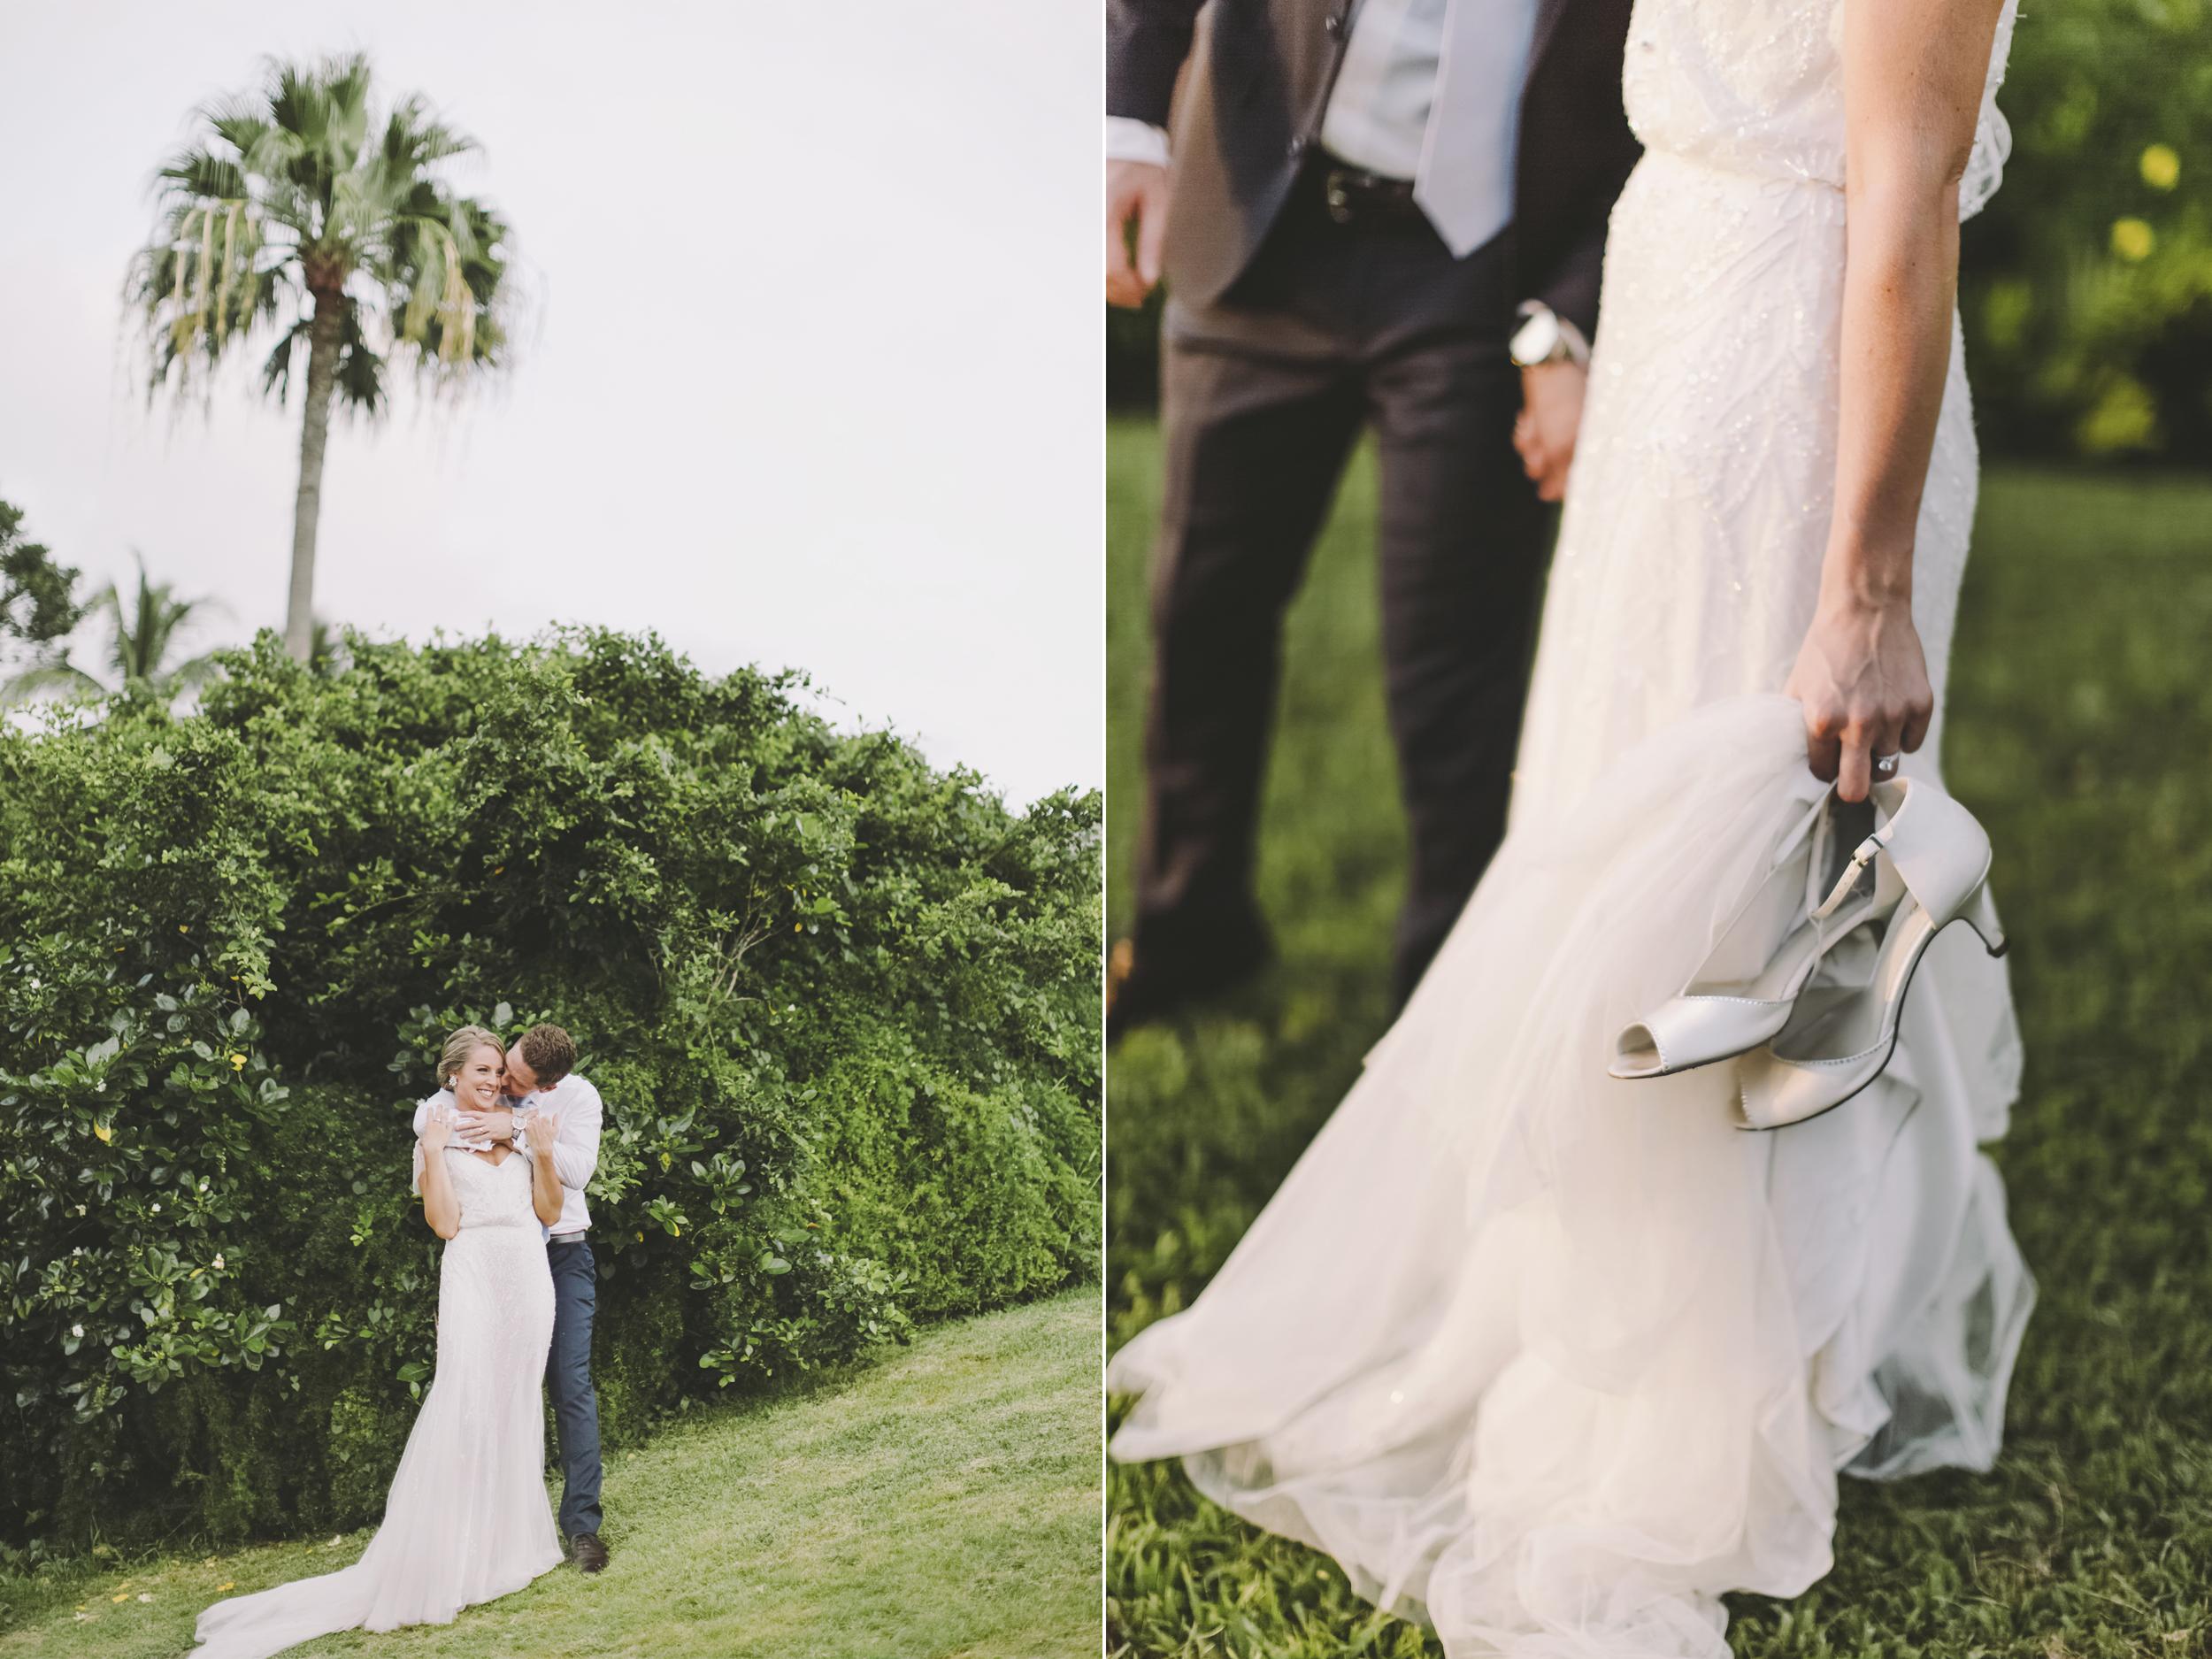 angie-diaz-photography-maui-wedding-mel-matt-96.jpg